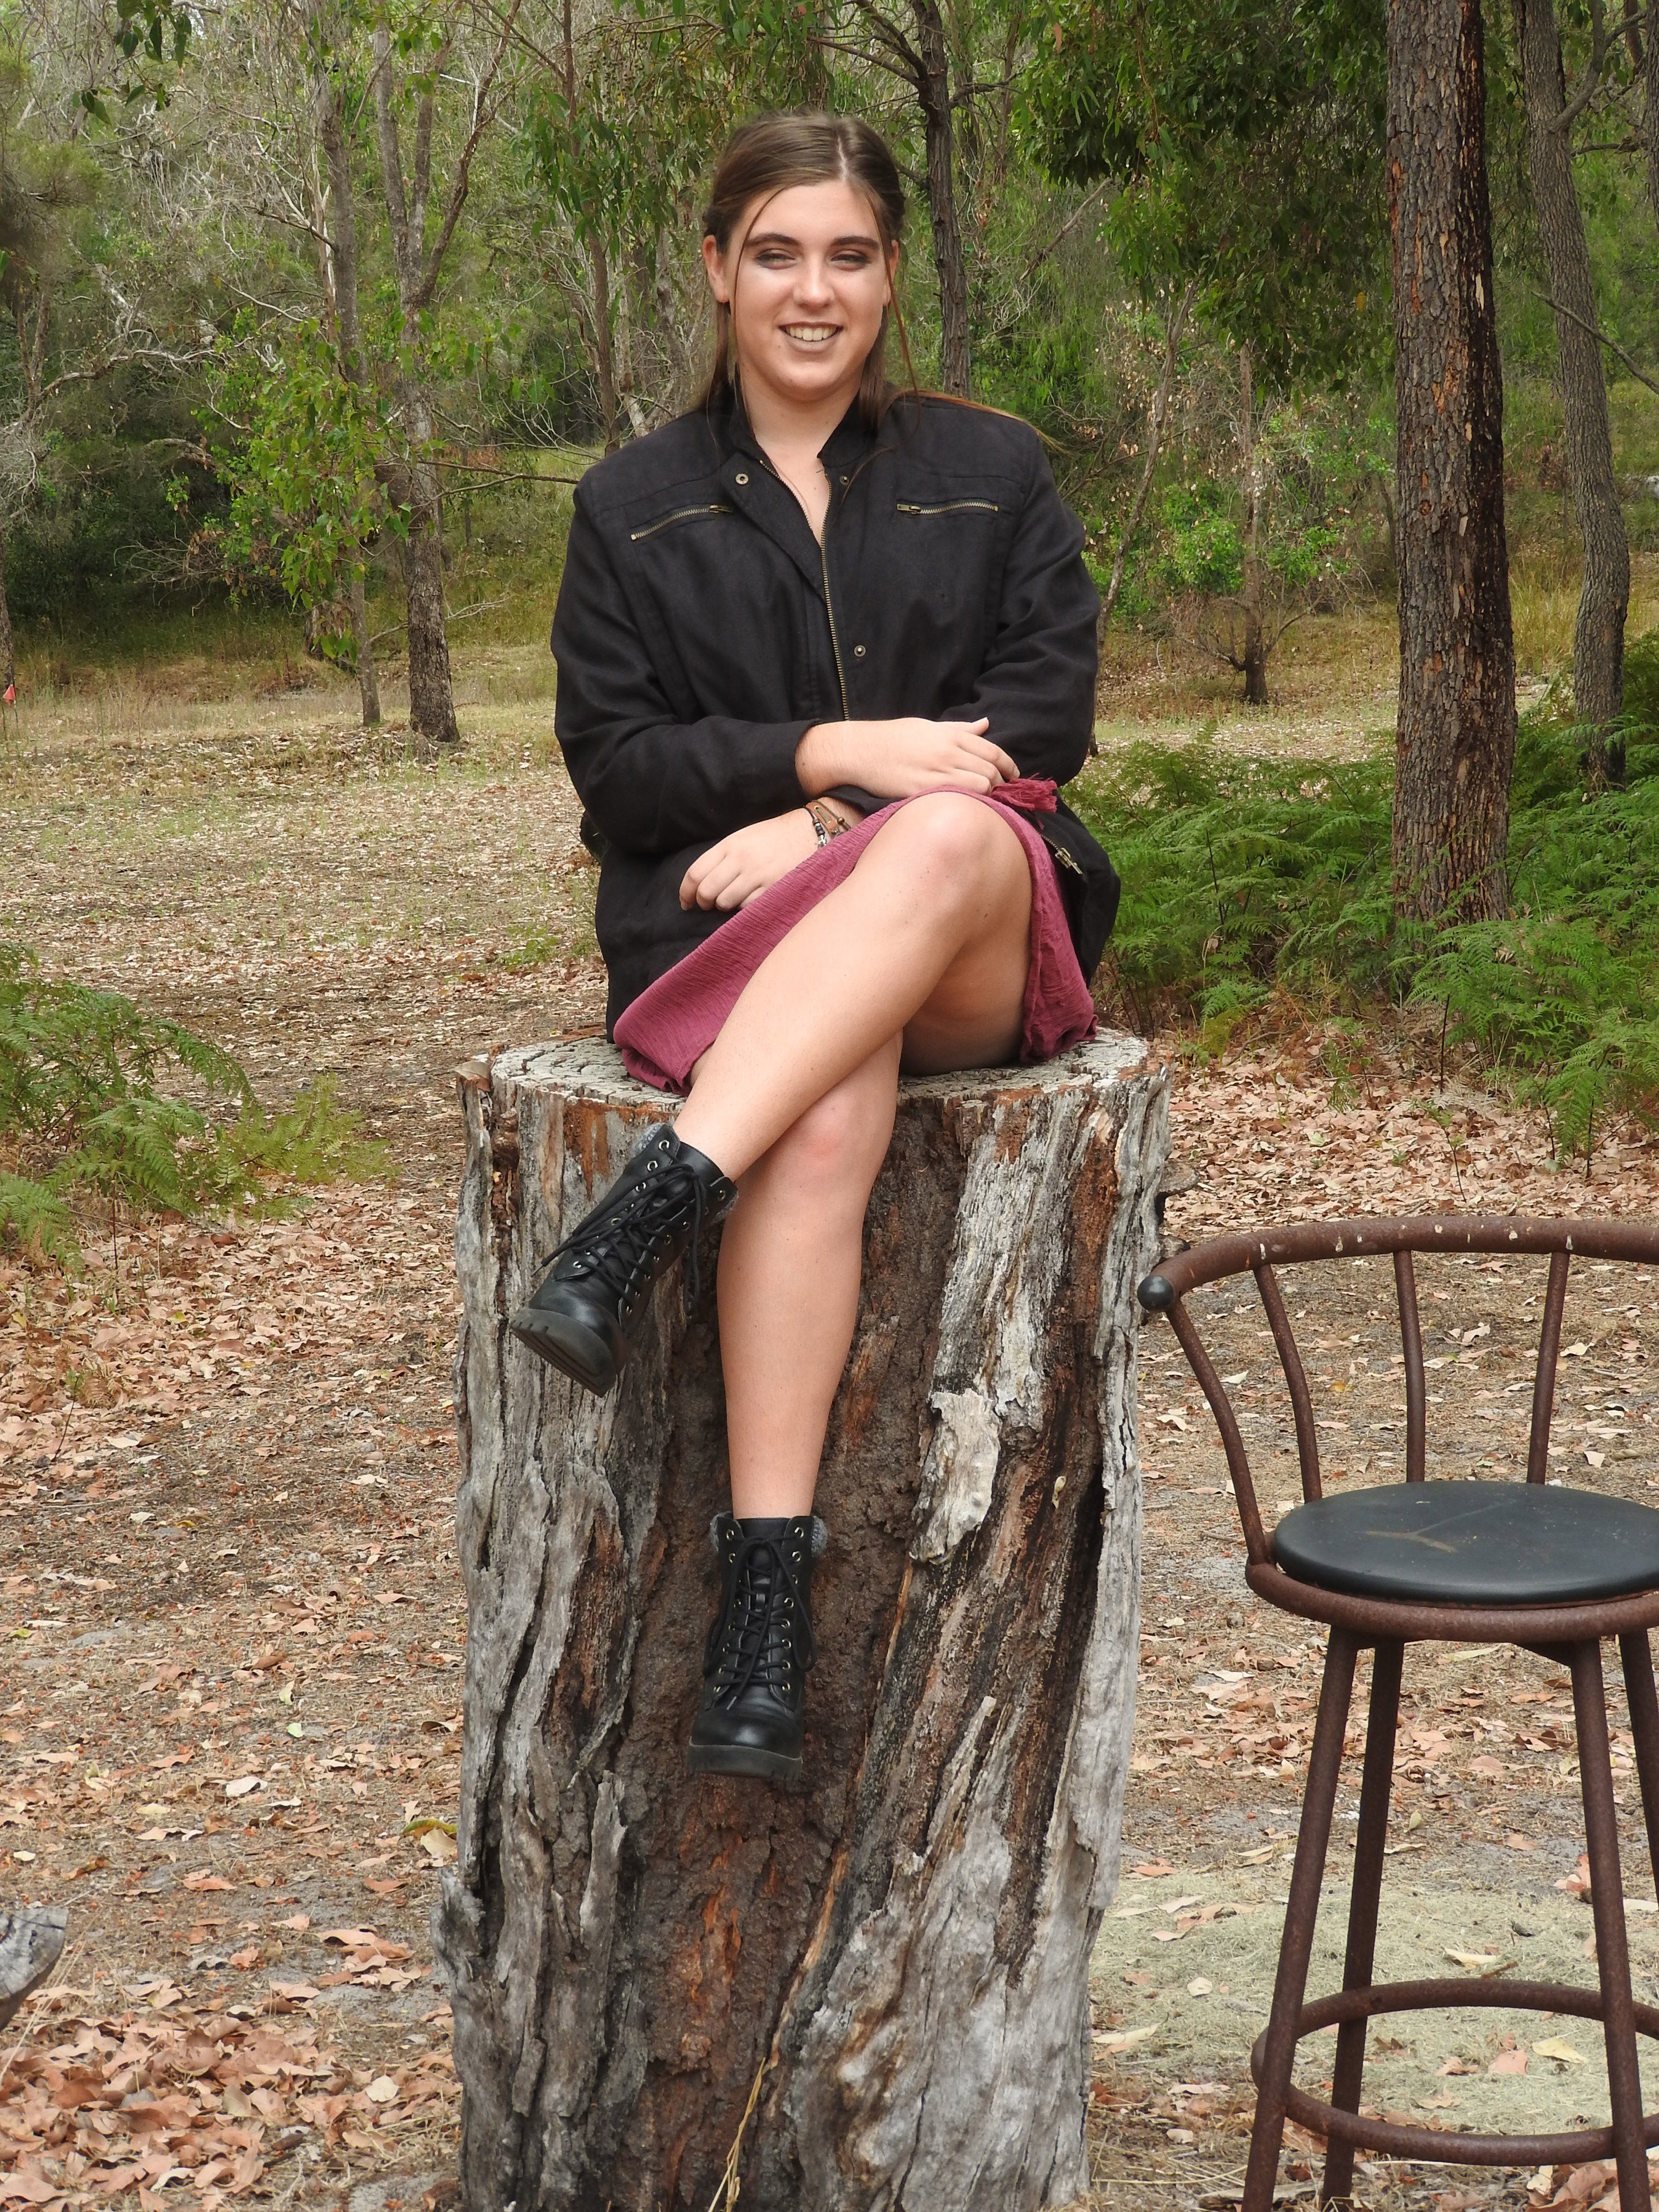 Kostenloses Stock Foto zu bäume, entspannung, fashion, fotoshooting